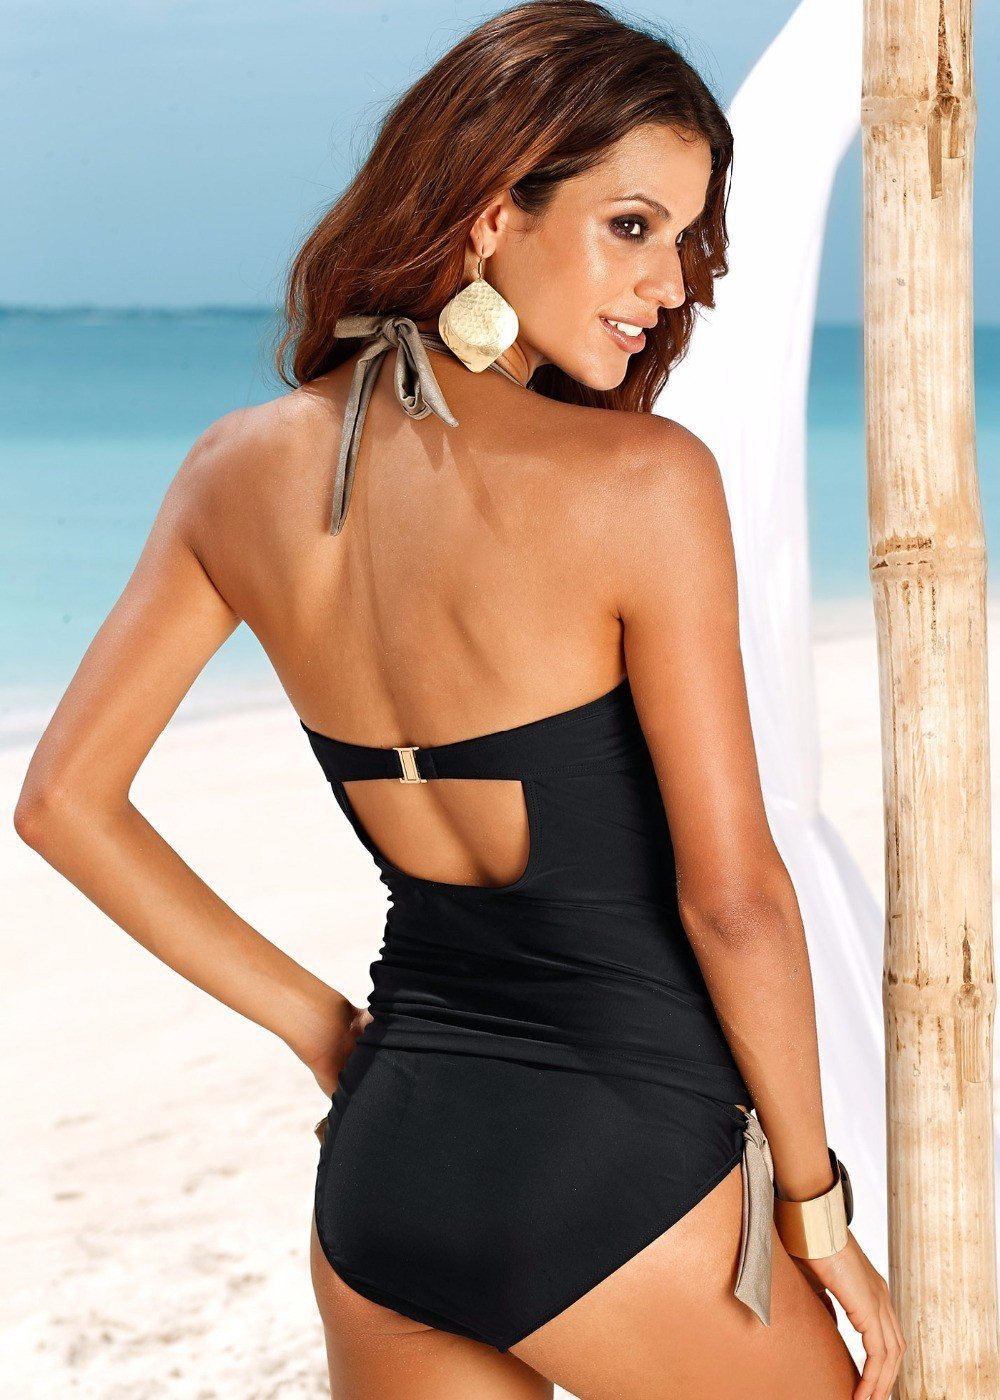 Bandage-Plus-Size-Swimwear-Buiqini-2016-Bathing-Suit-Women-Swimsuit-Summer-Beach-Push-Up-Bikini-Set (2)